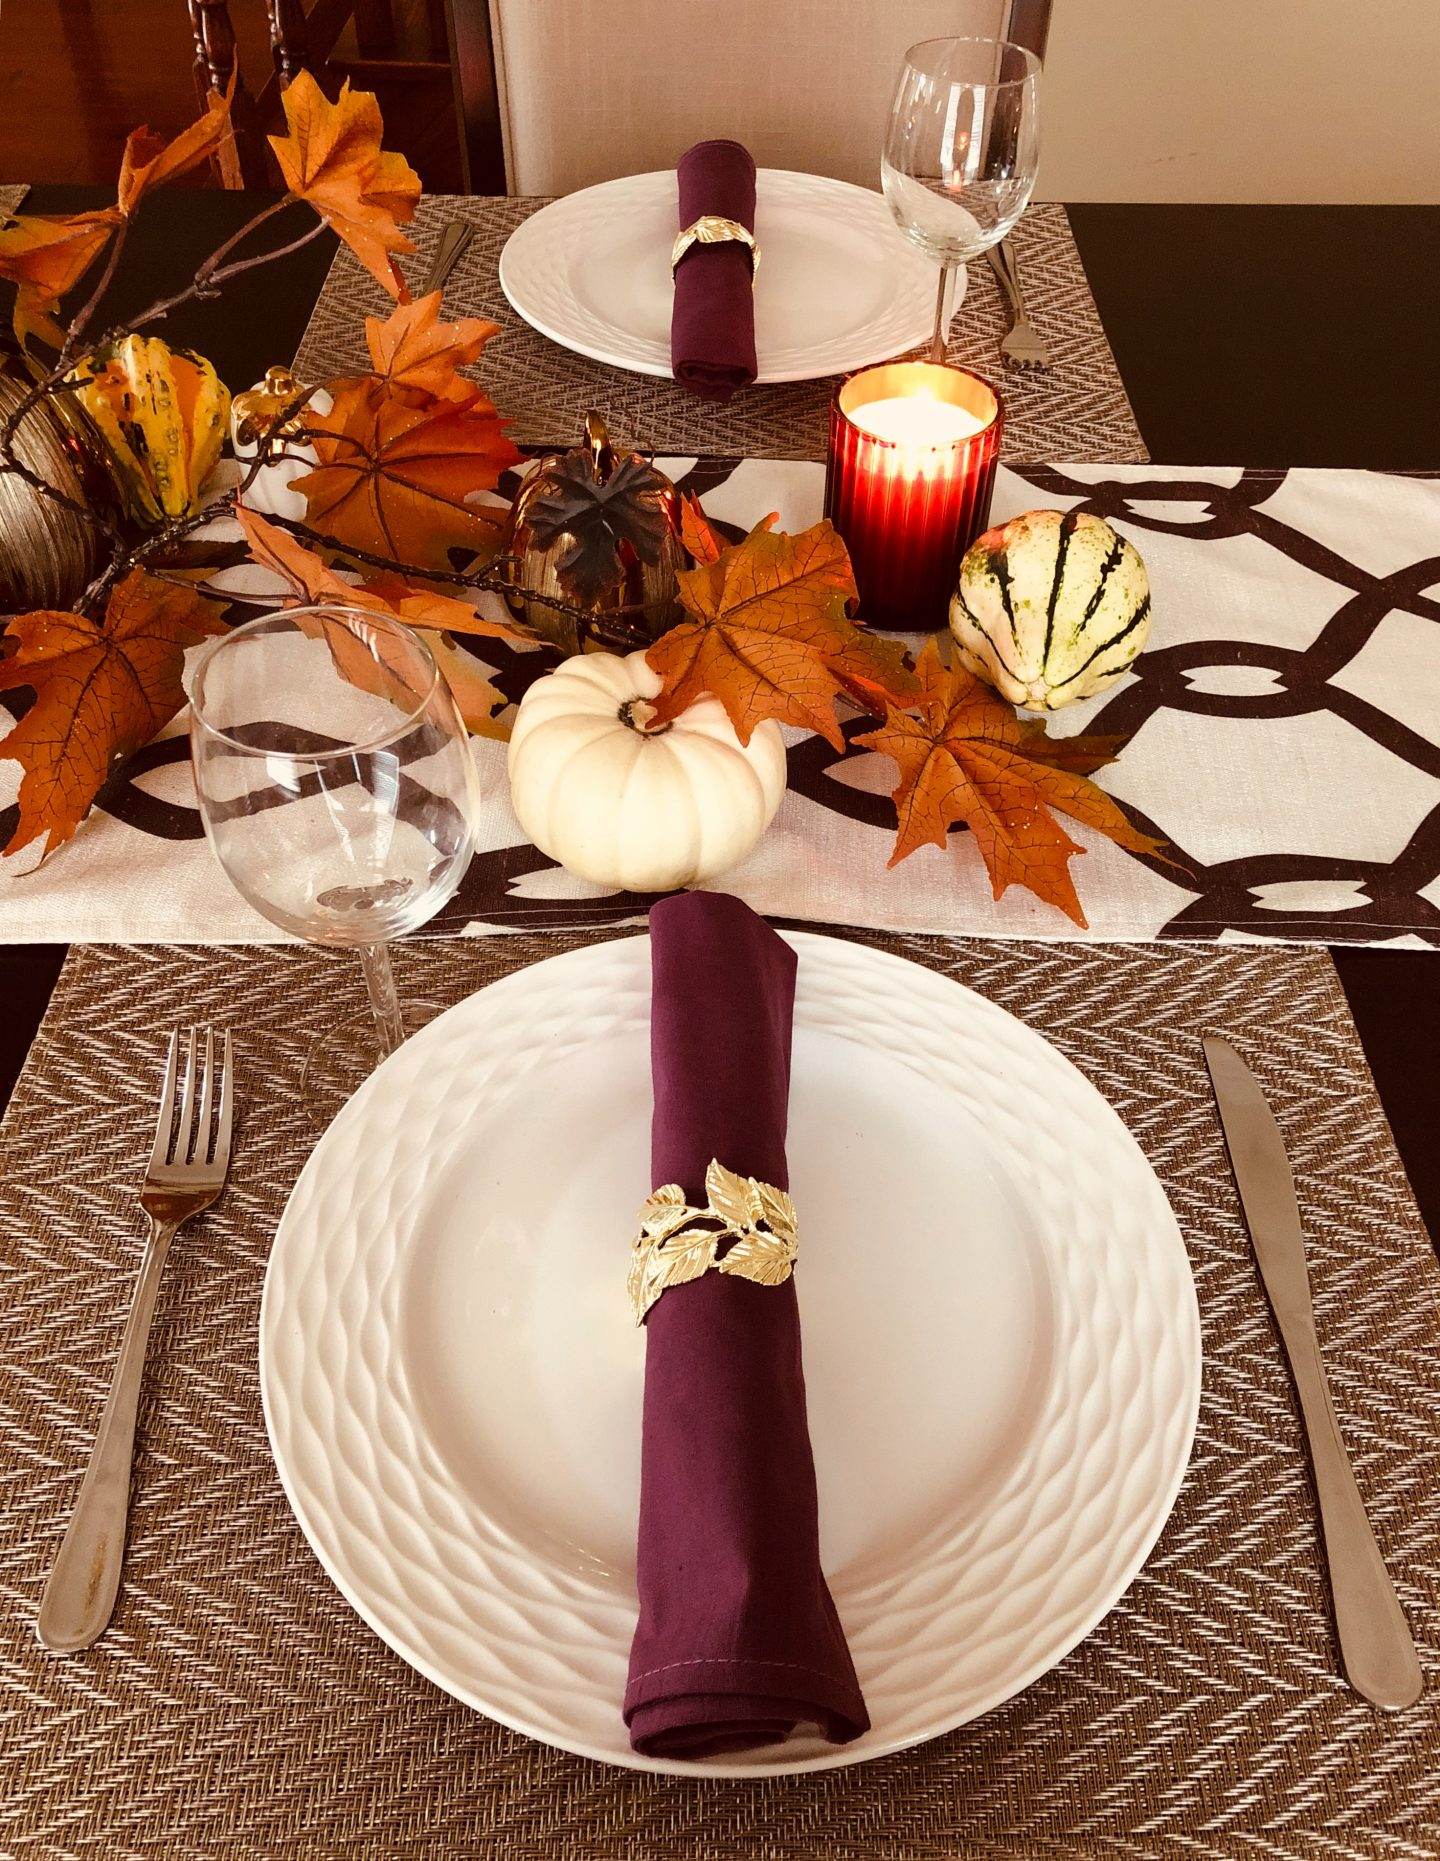 Autumn Romance Collection x Avon Home